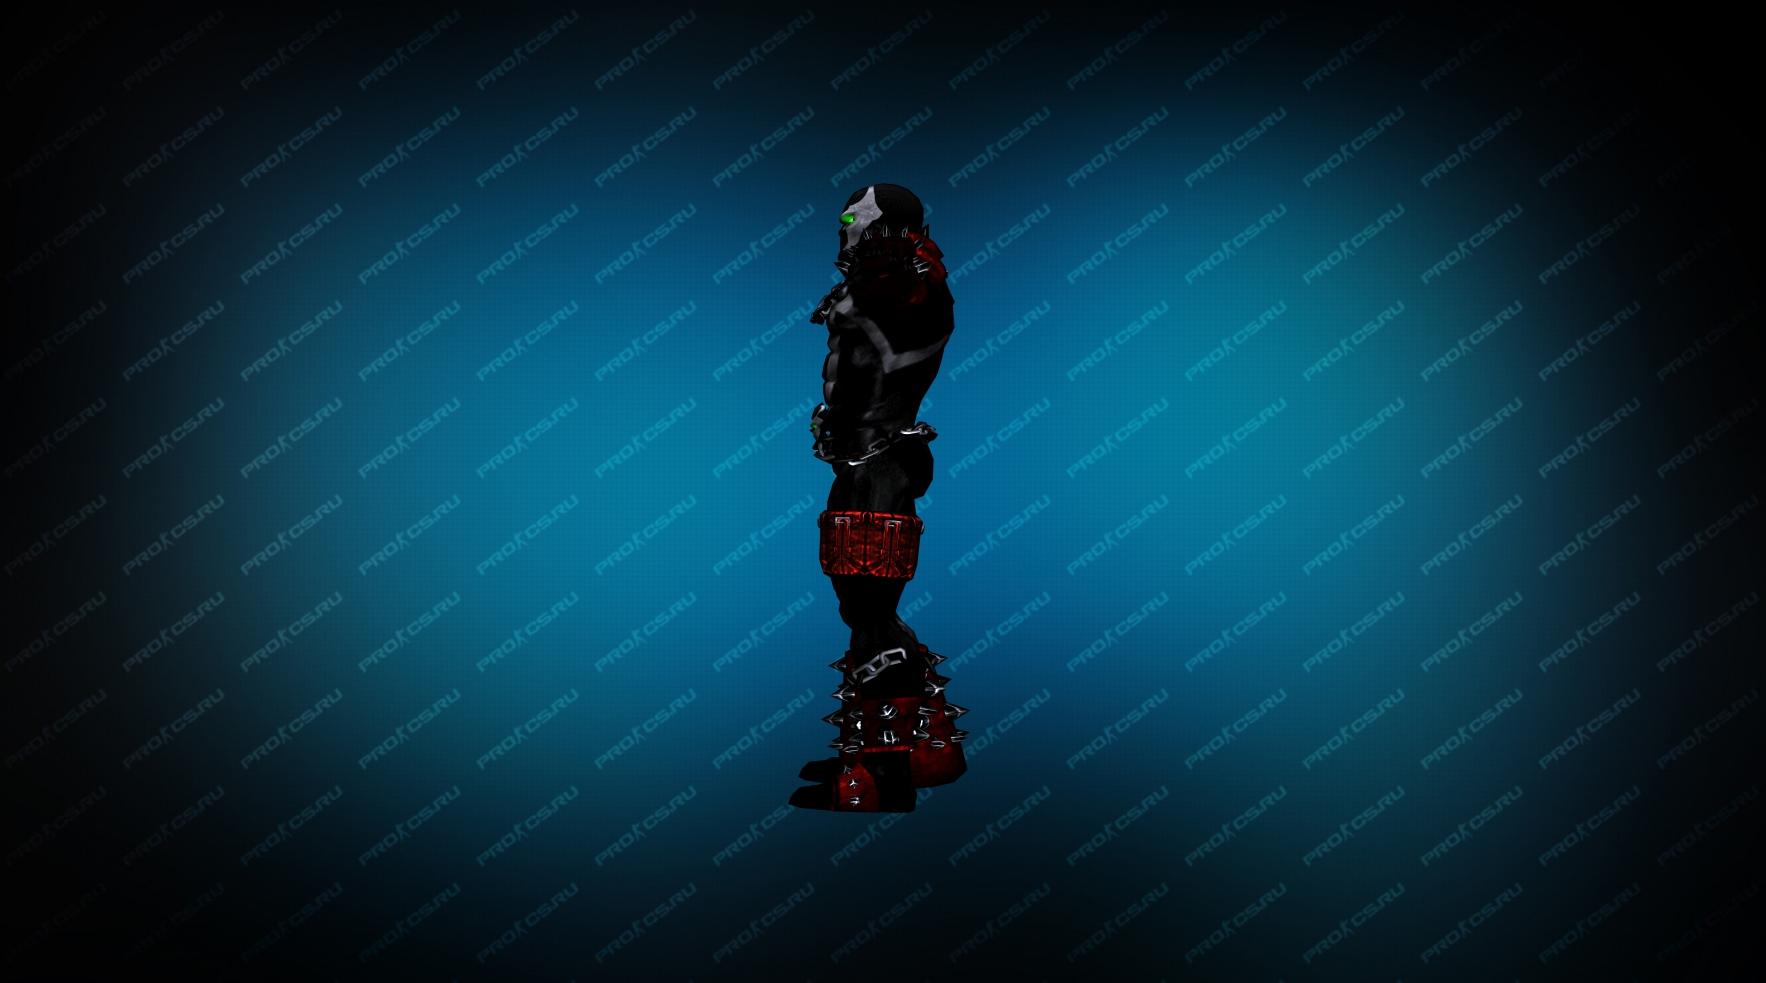 Модель игрока «Spawn» вид сбоку